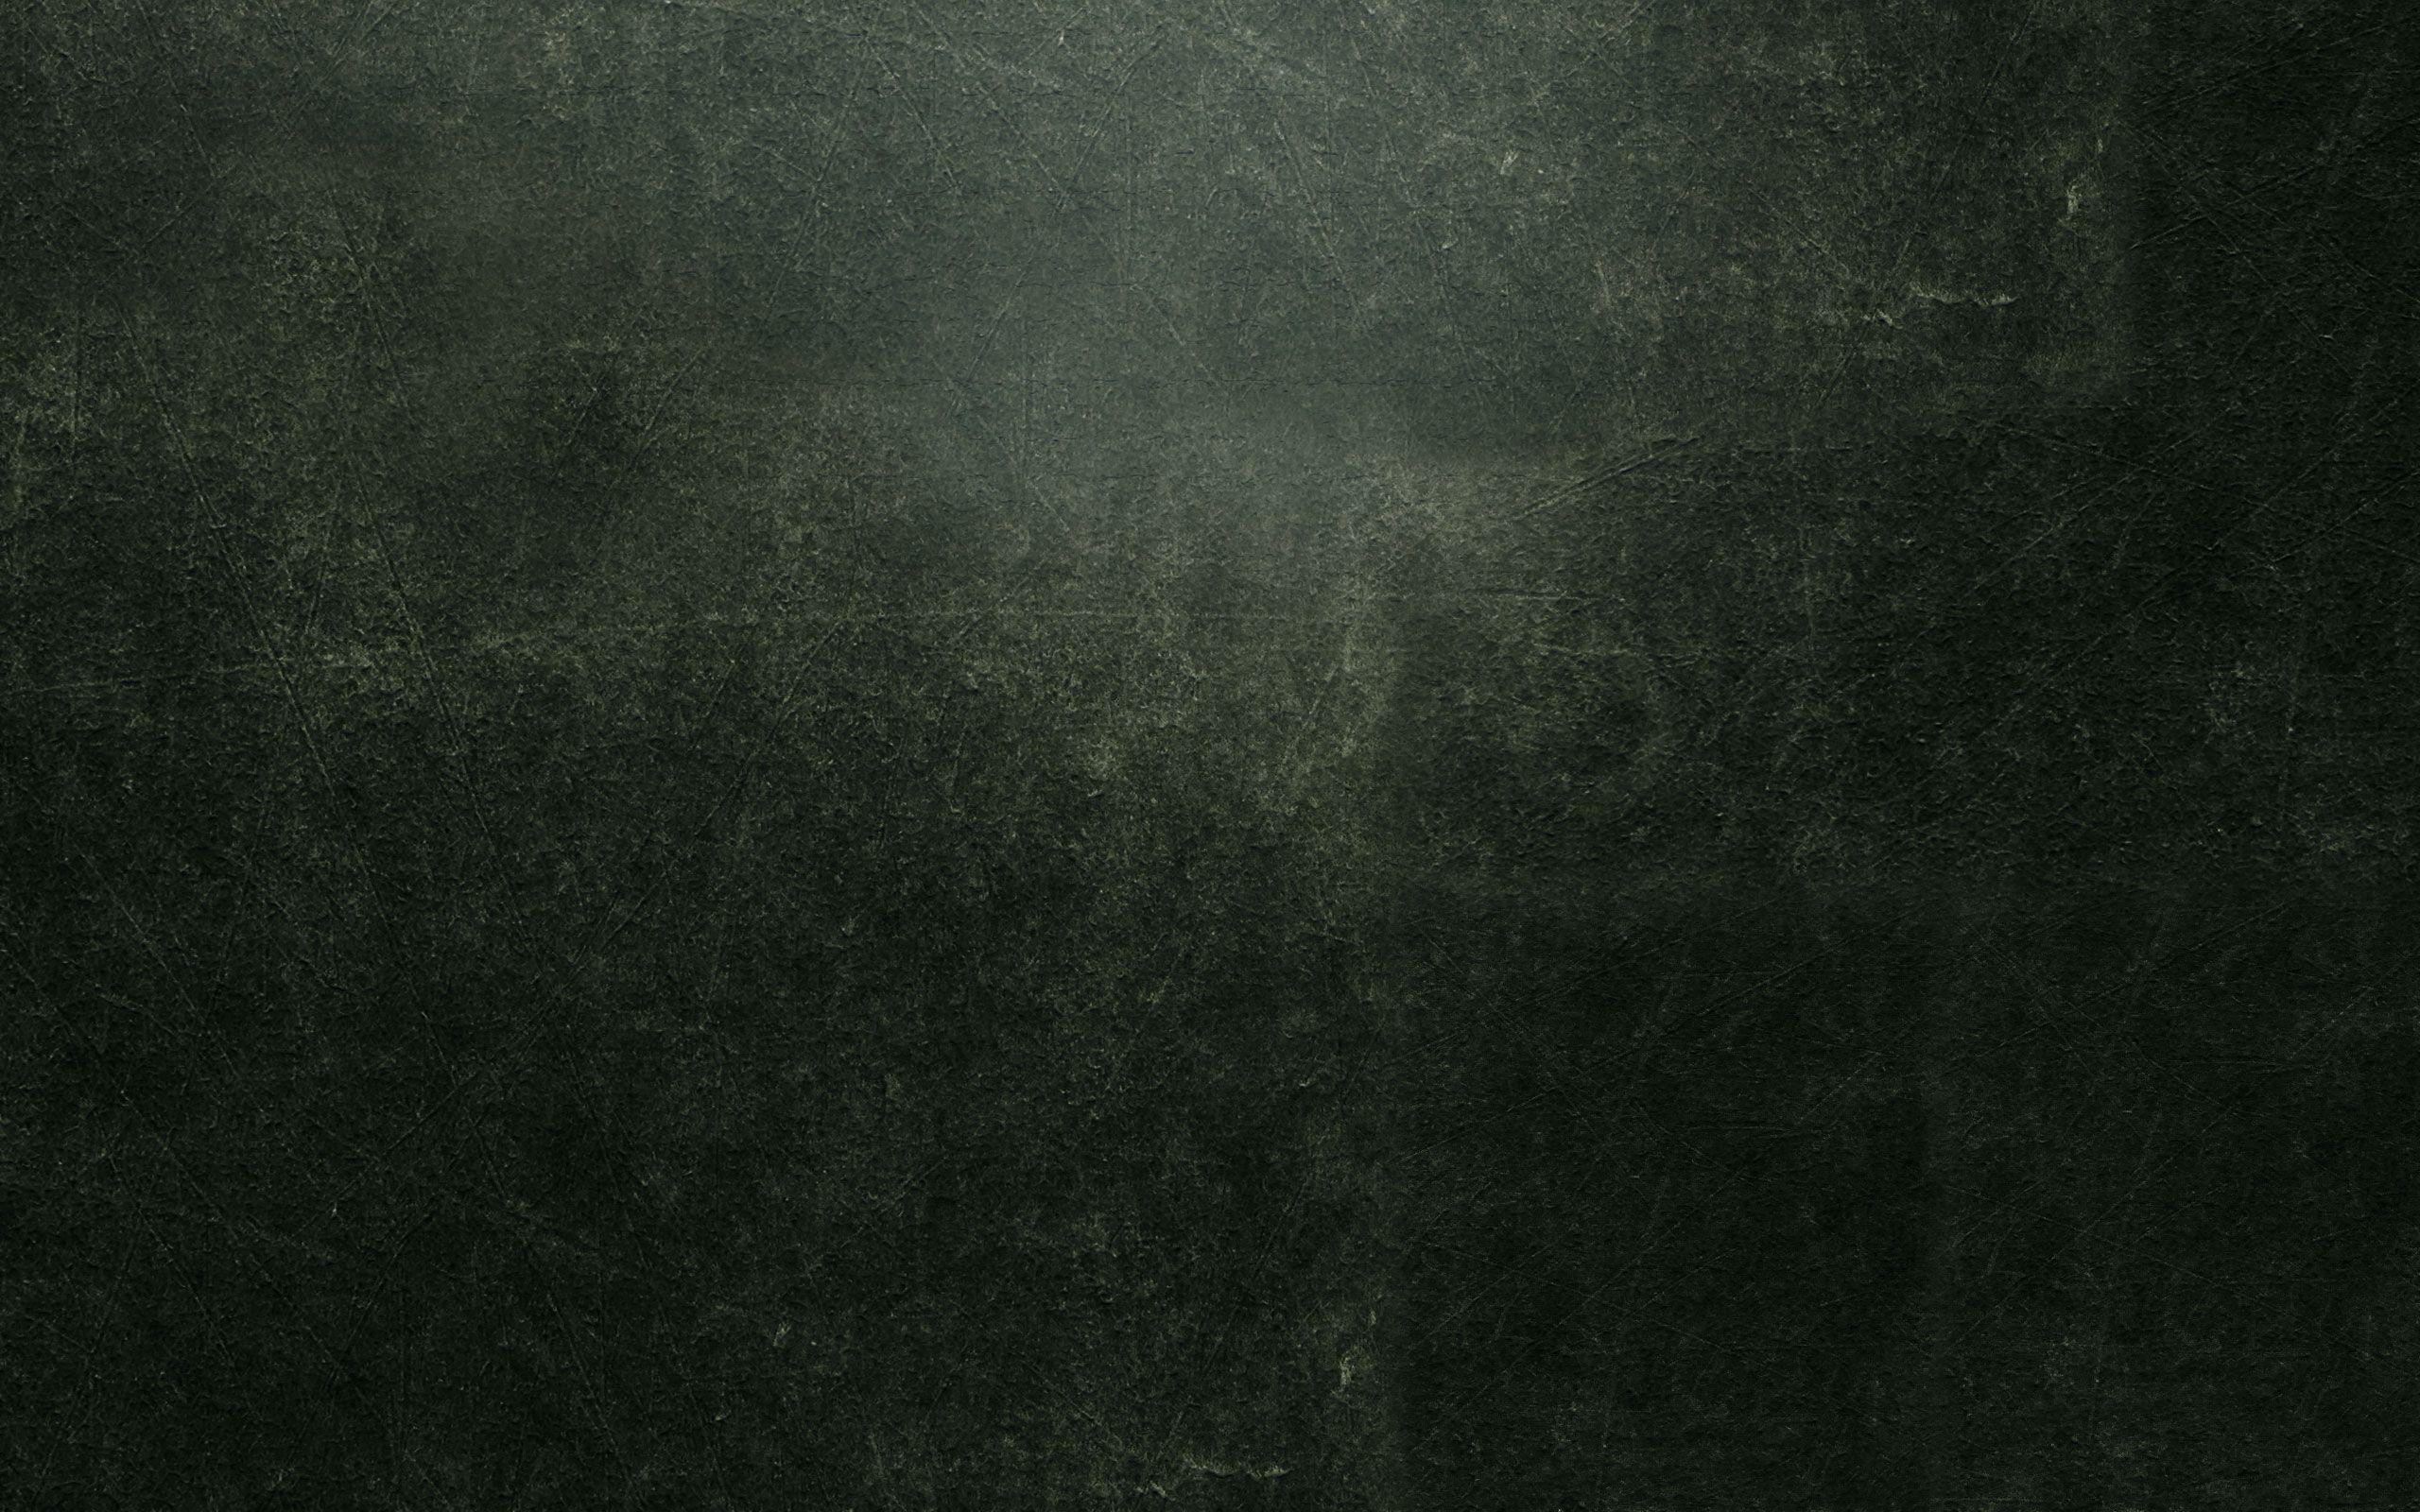 Black Minimalistic Textures Wallpaper Black And Grey